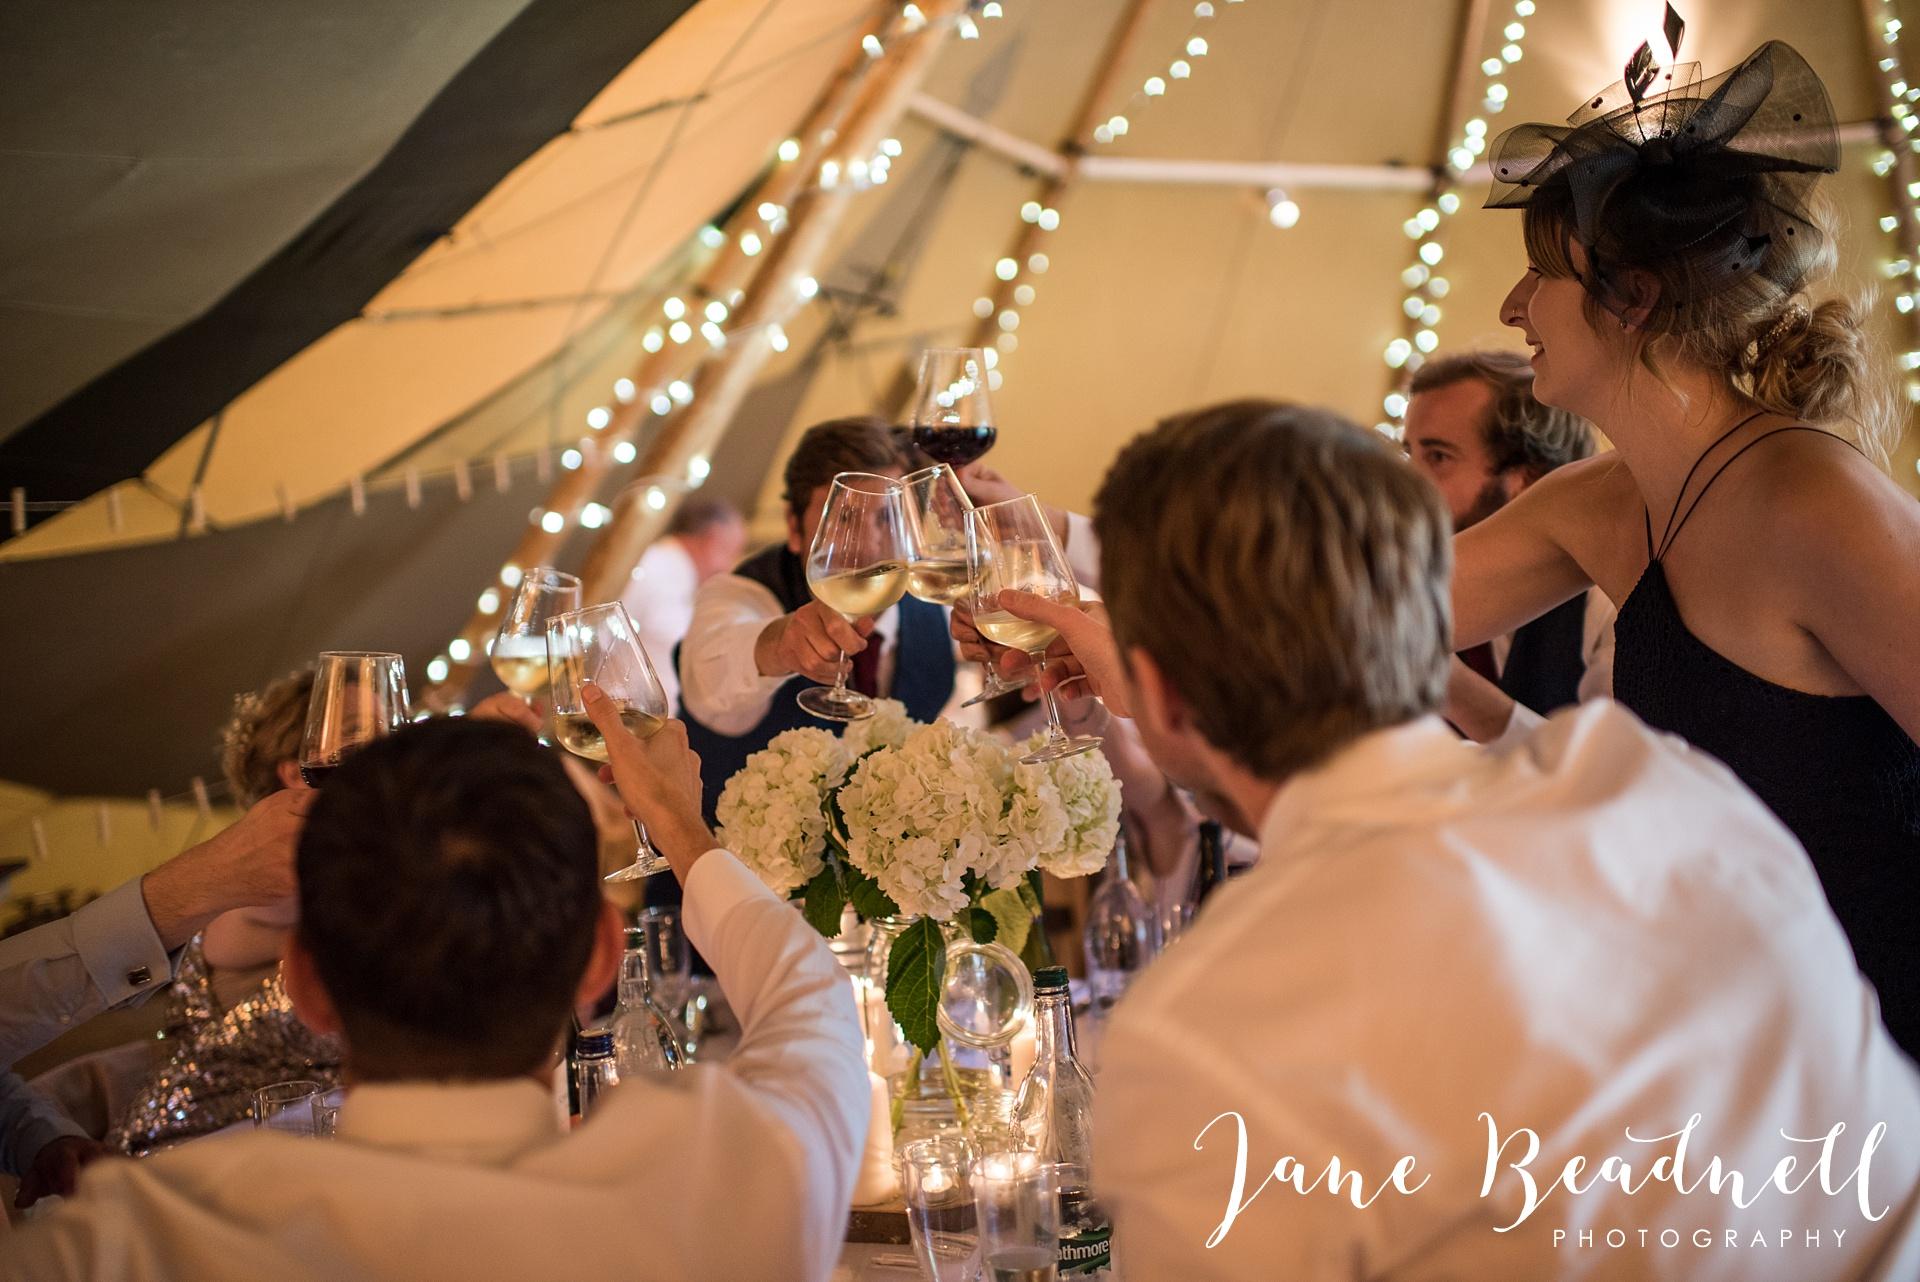 fine-art-wedding-photographer-jane-beadnell-yorkshire-wedding-photographer_0127